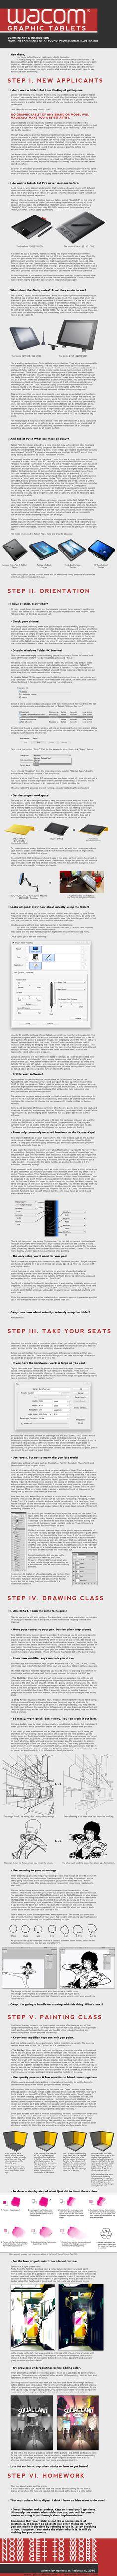 Wacom Starters Guide 2011 by fox-orian.deviantart.com on @deviantART